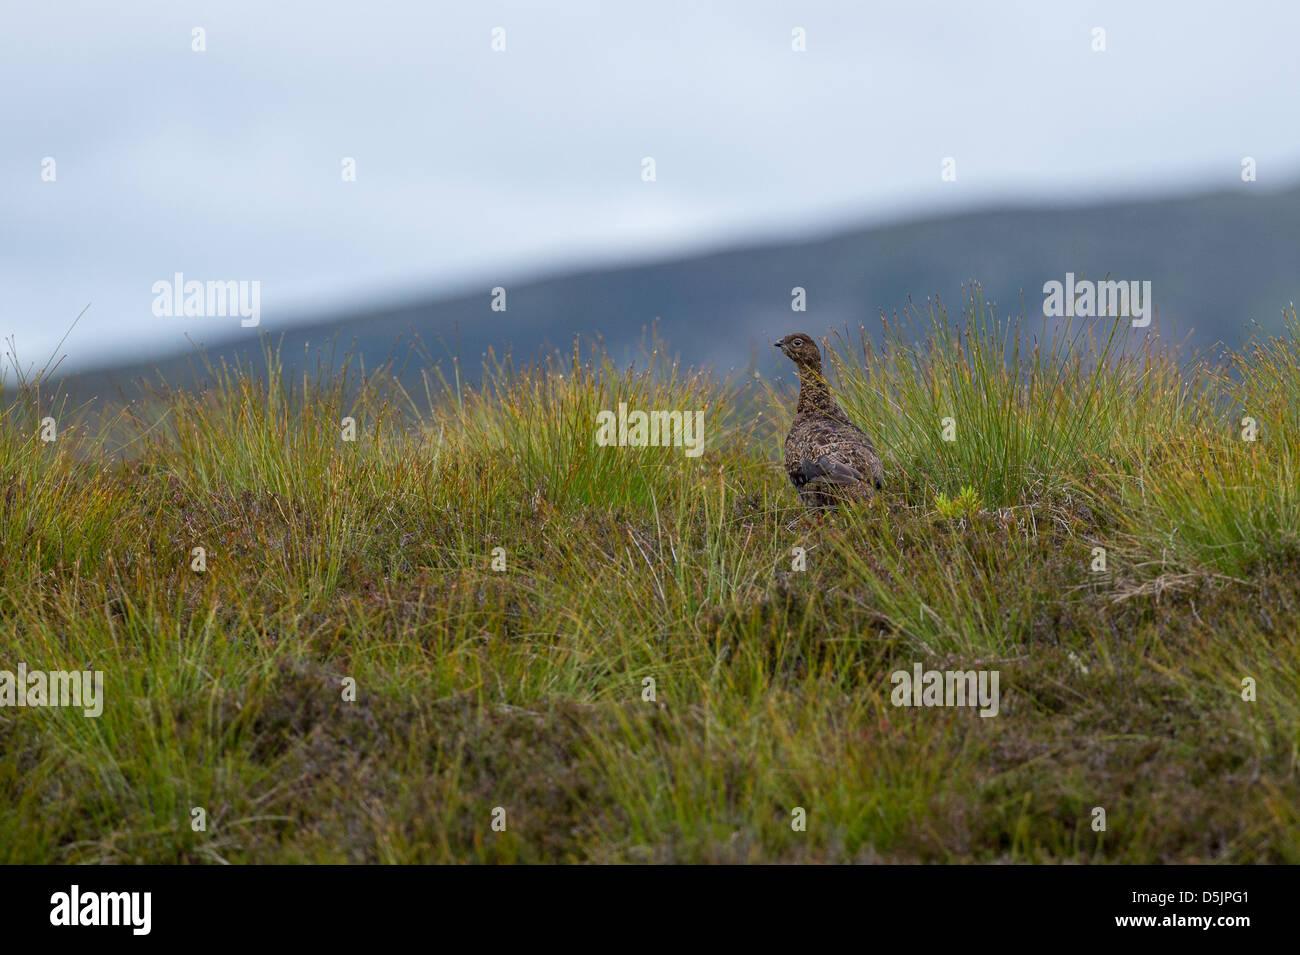 Pheasant amongst gorse, Scotland - Stock Image